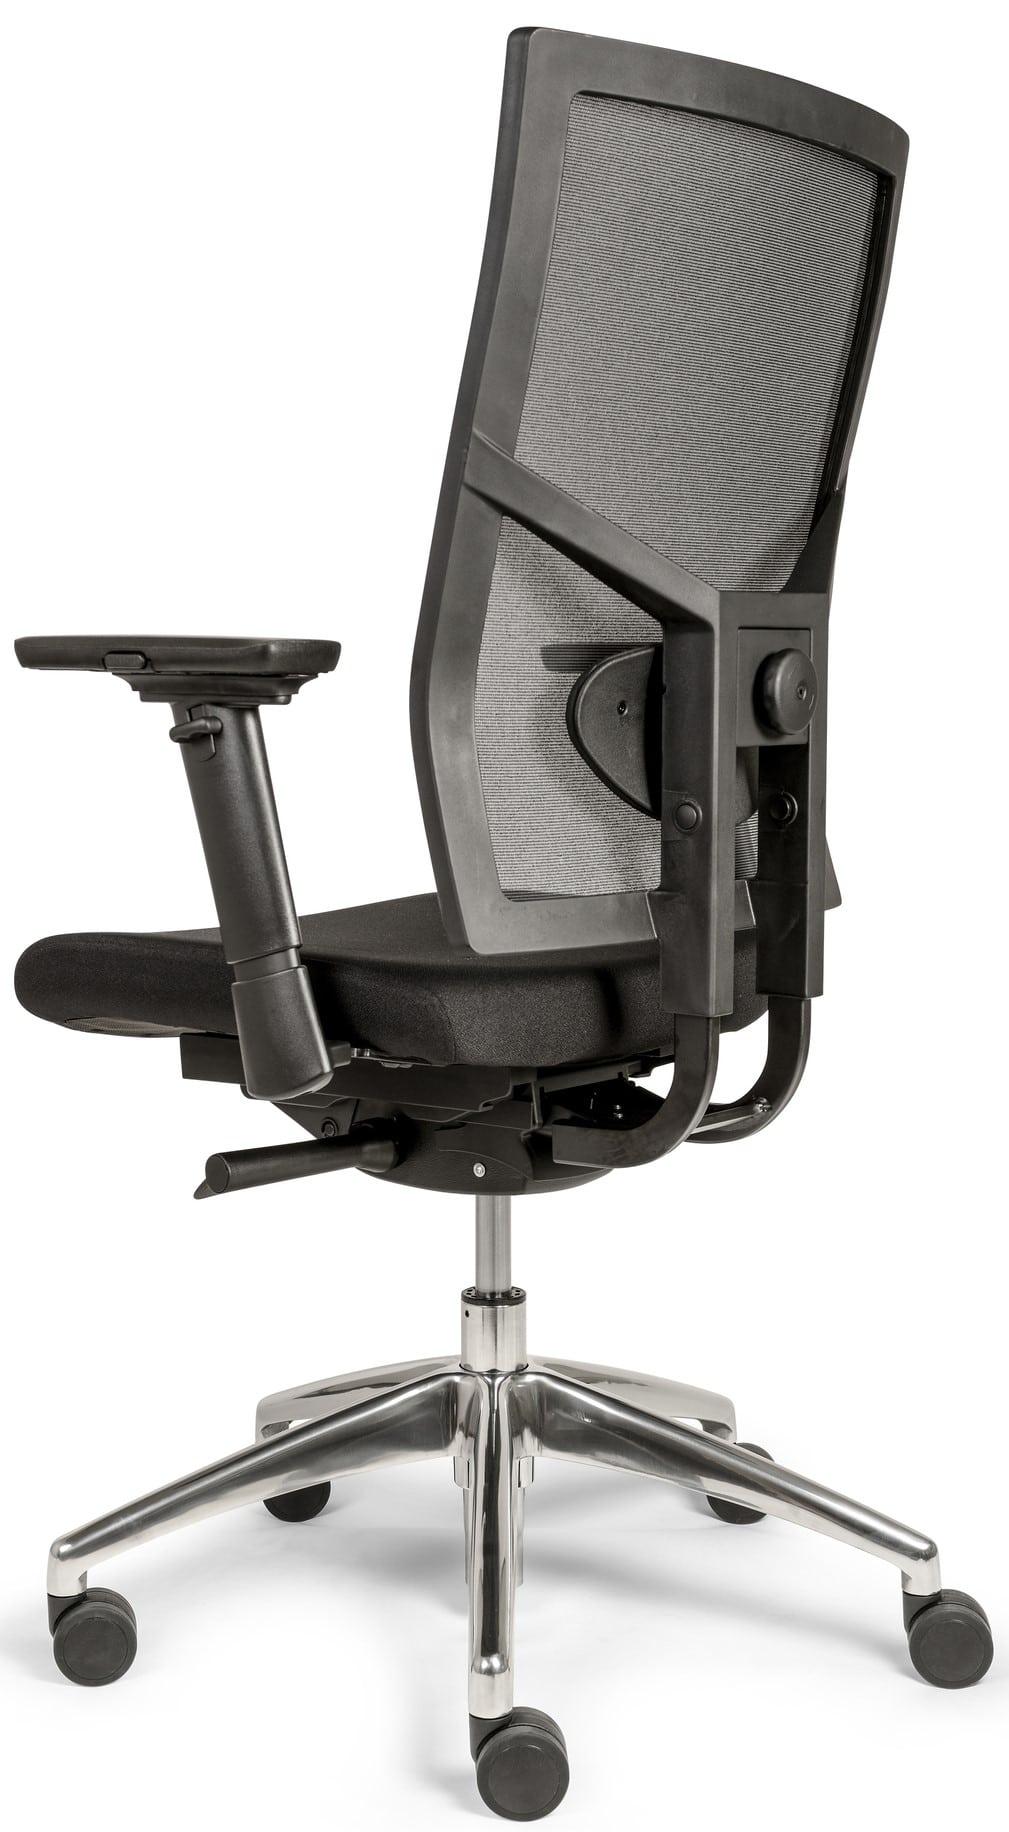 EN 1335 Bureaustoel (TIP) uit voorraad leverbaar thuiswerk